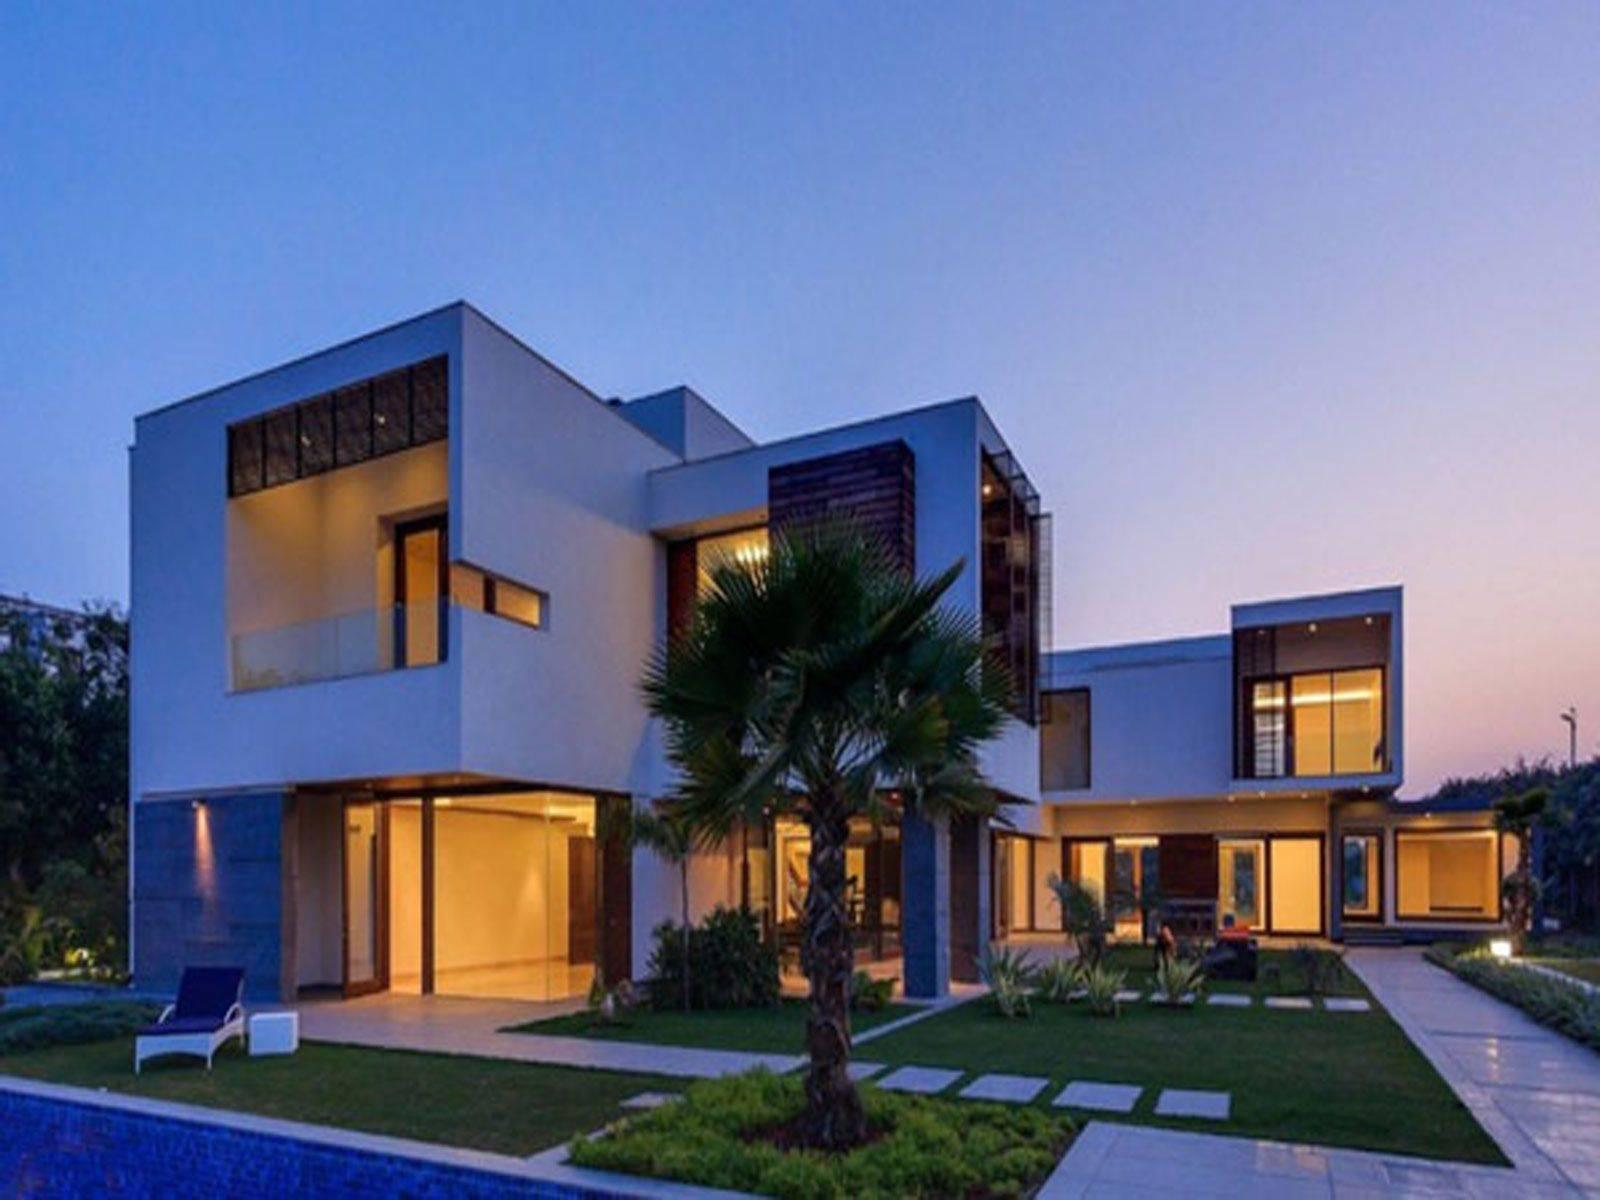 Modern Minimalist Home Design Ideas Japanese House Home Plans Blueprints 82912